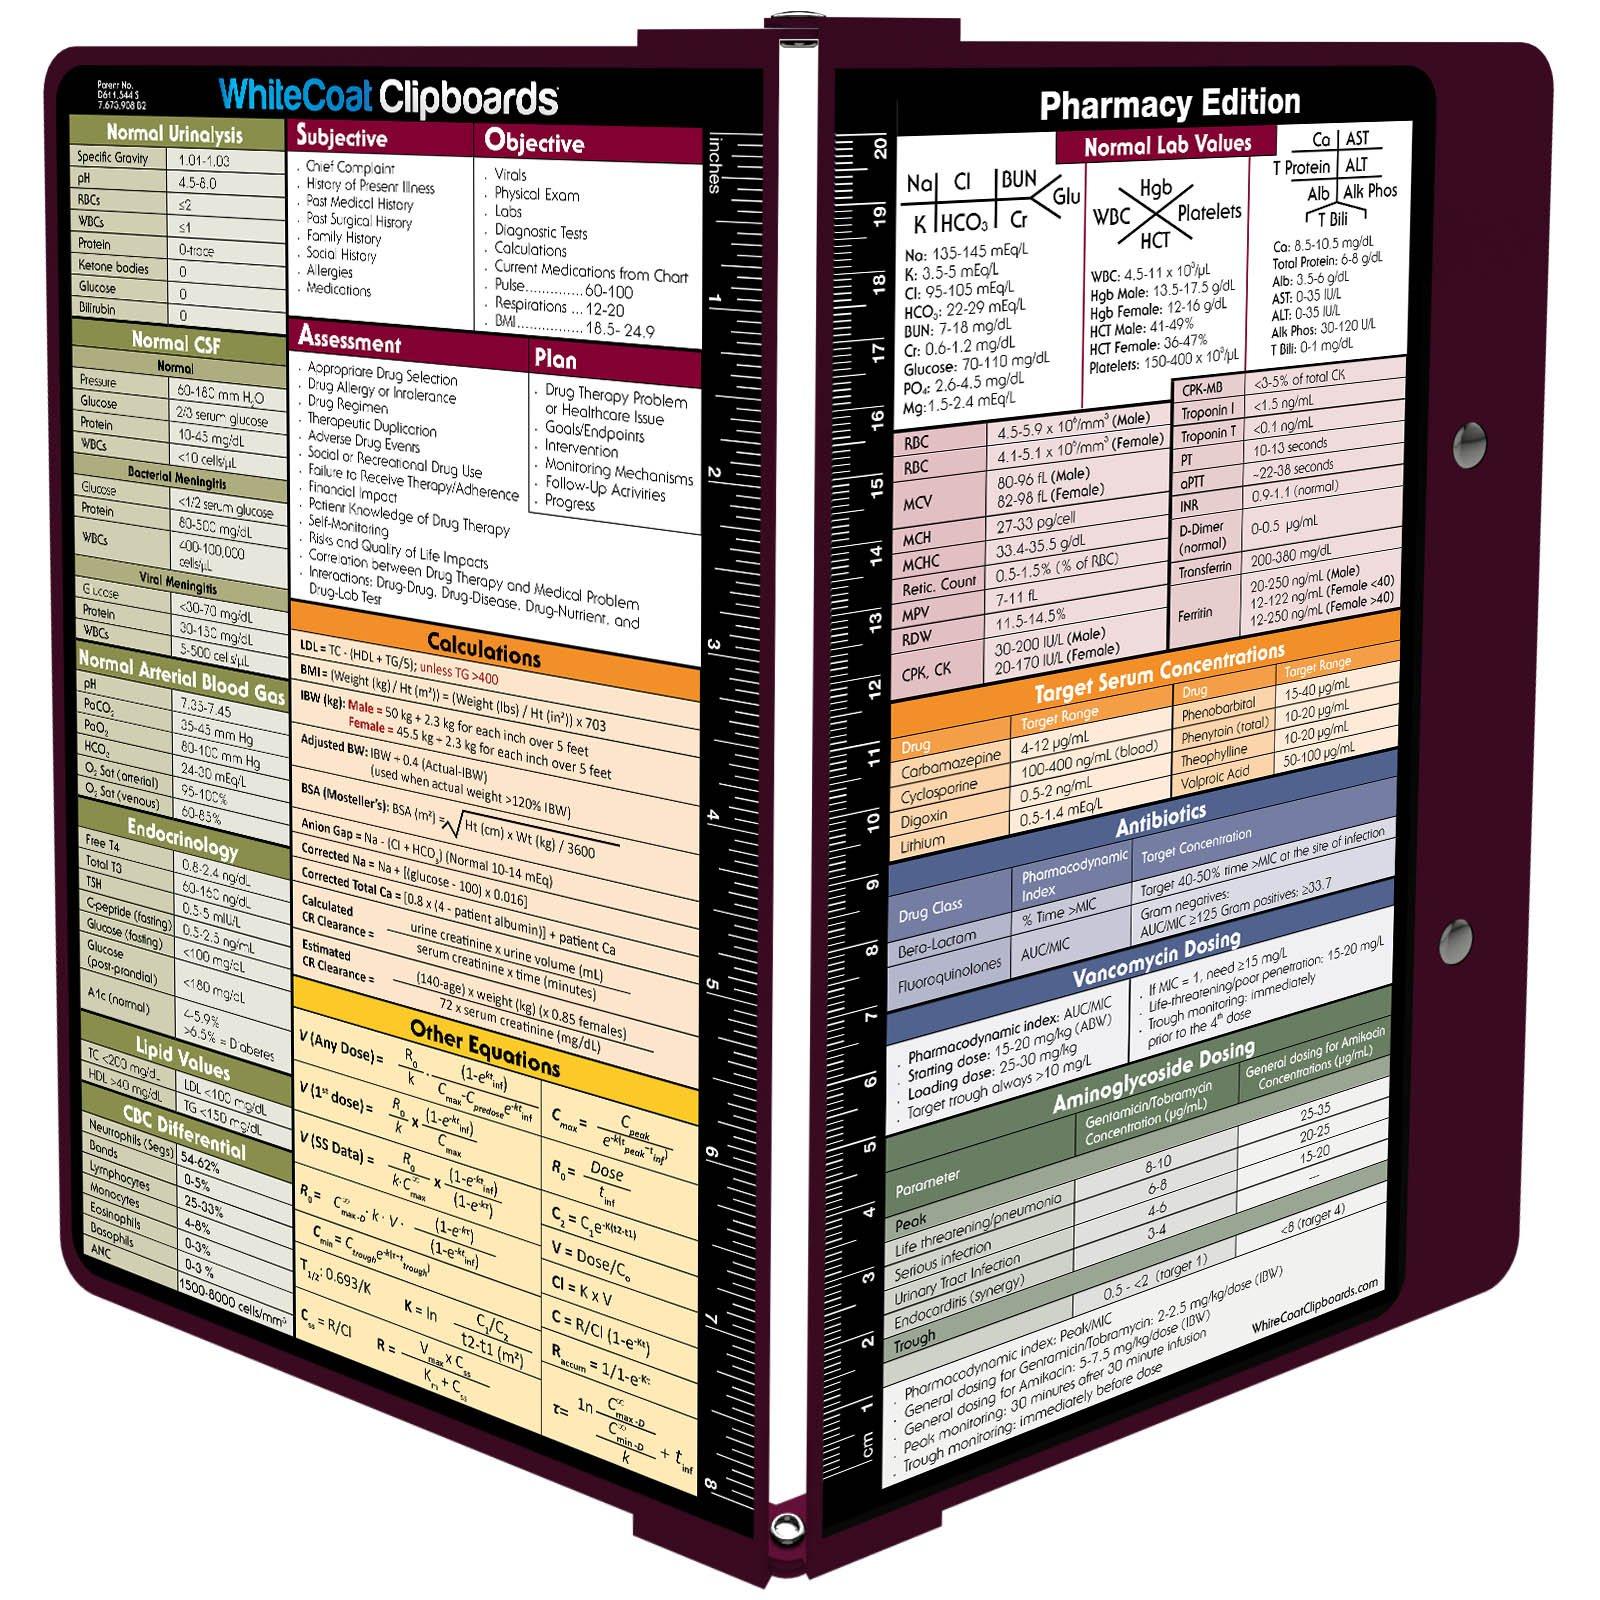 WhiteCoat Clipboard- Wine - Pharmacy Edition by WhiteCoat Clipboard